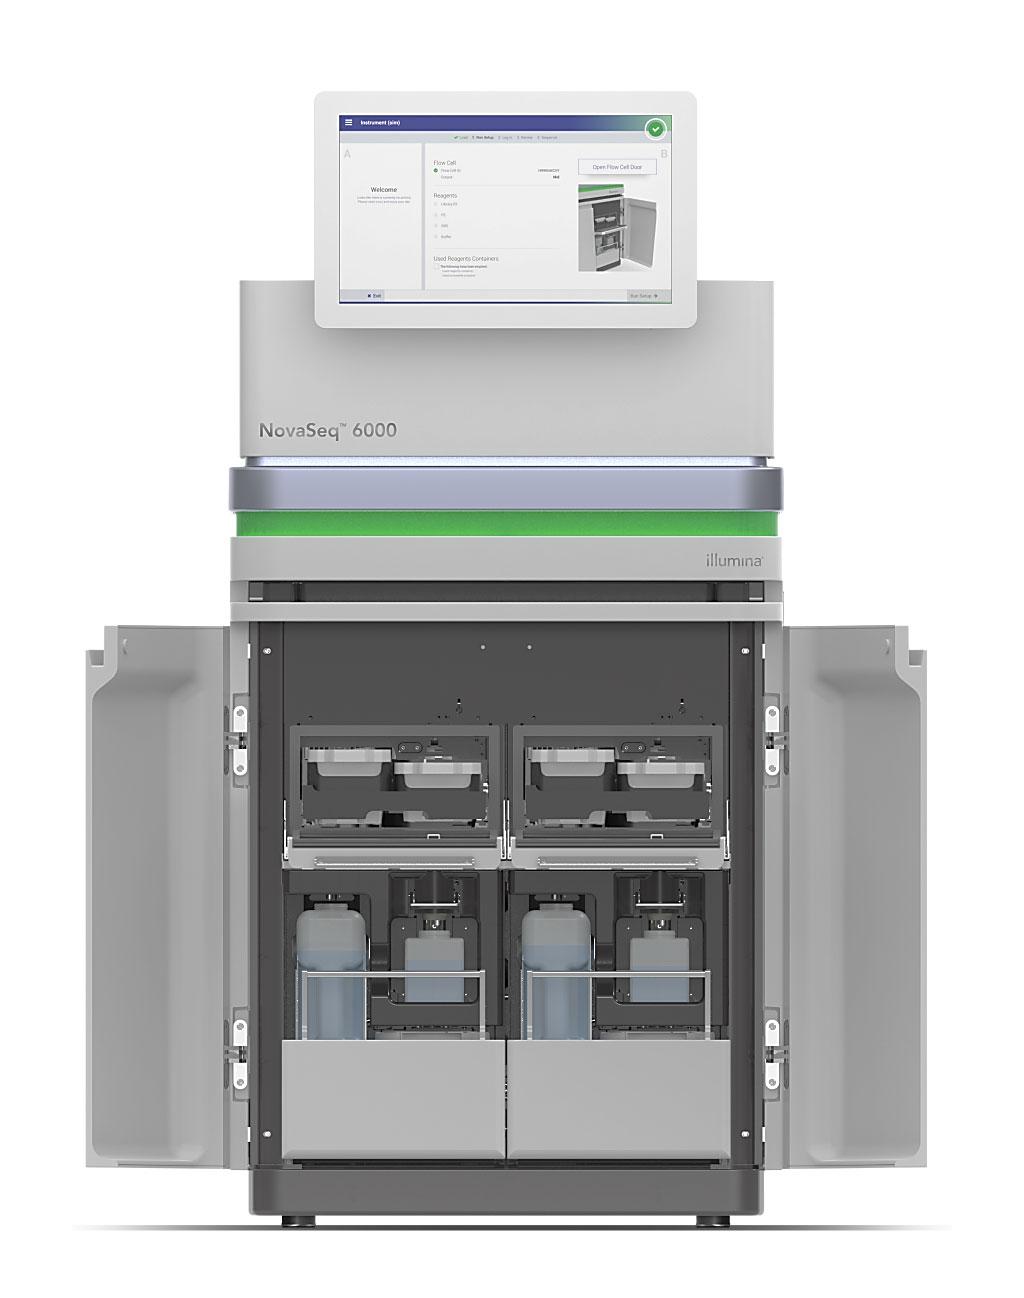 Image: The NovaSeq 6000 sequencing instrument (Photo courtesy of Illumina)